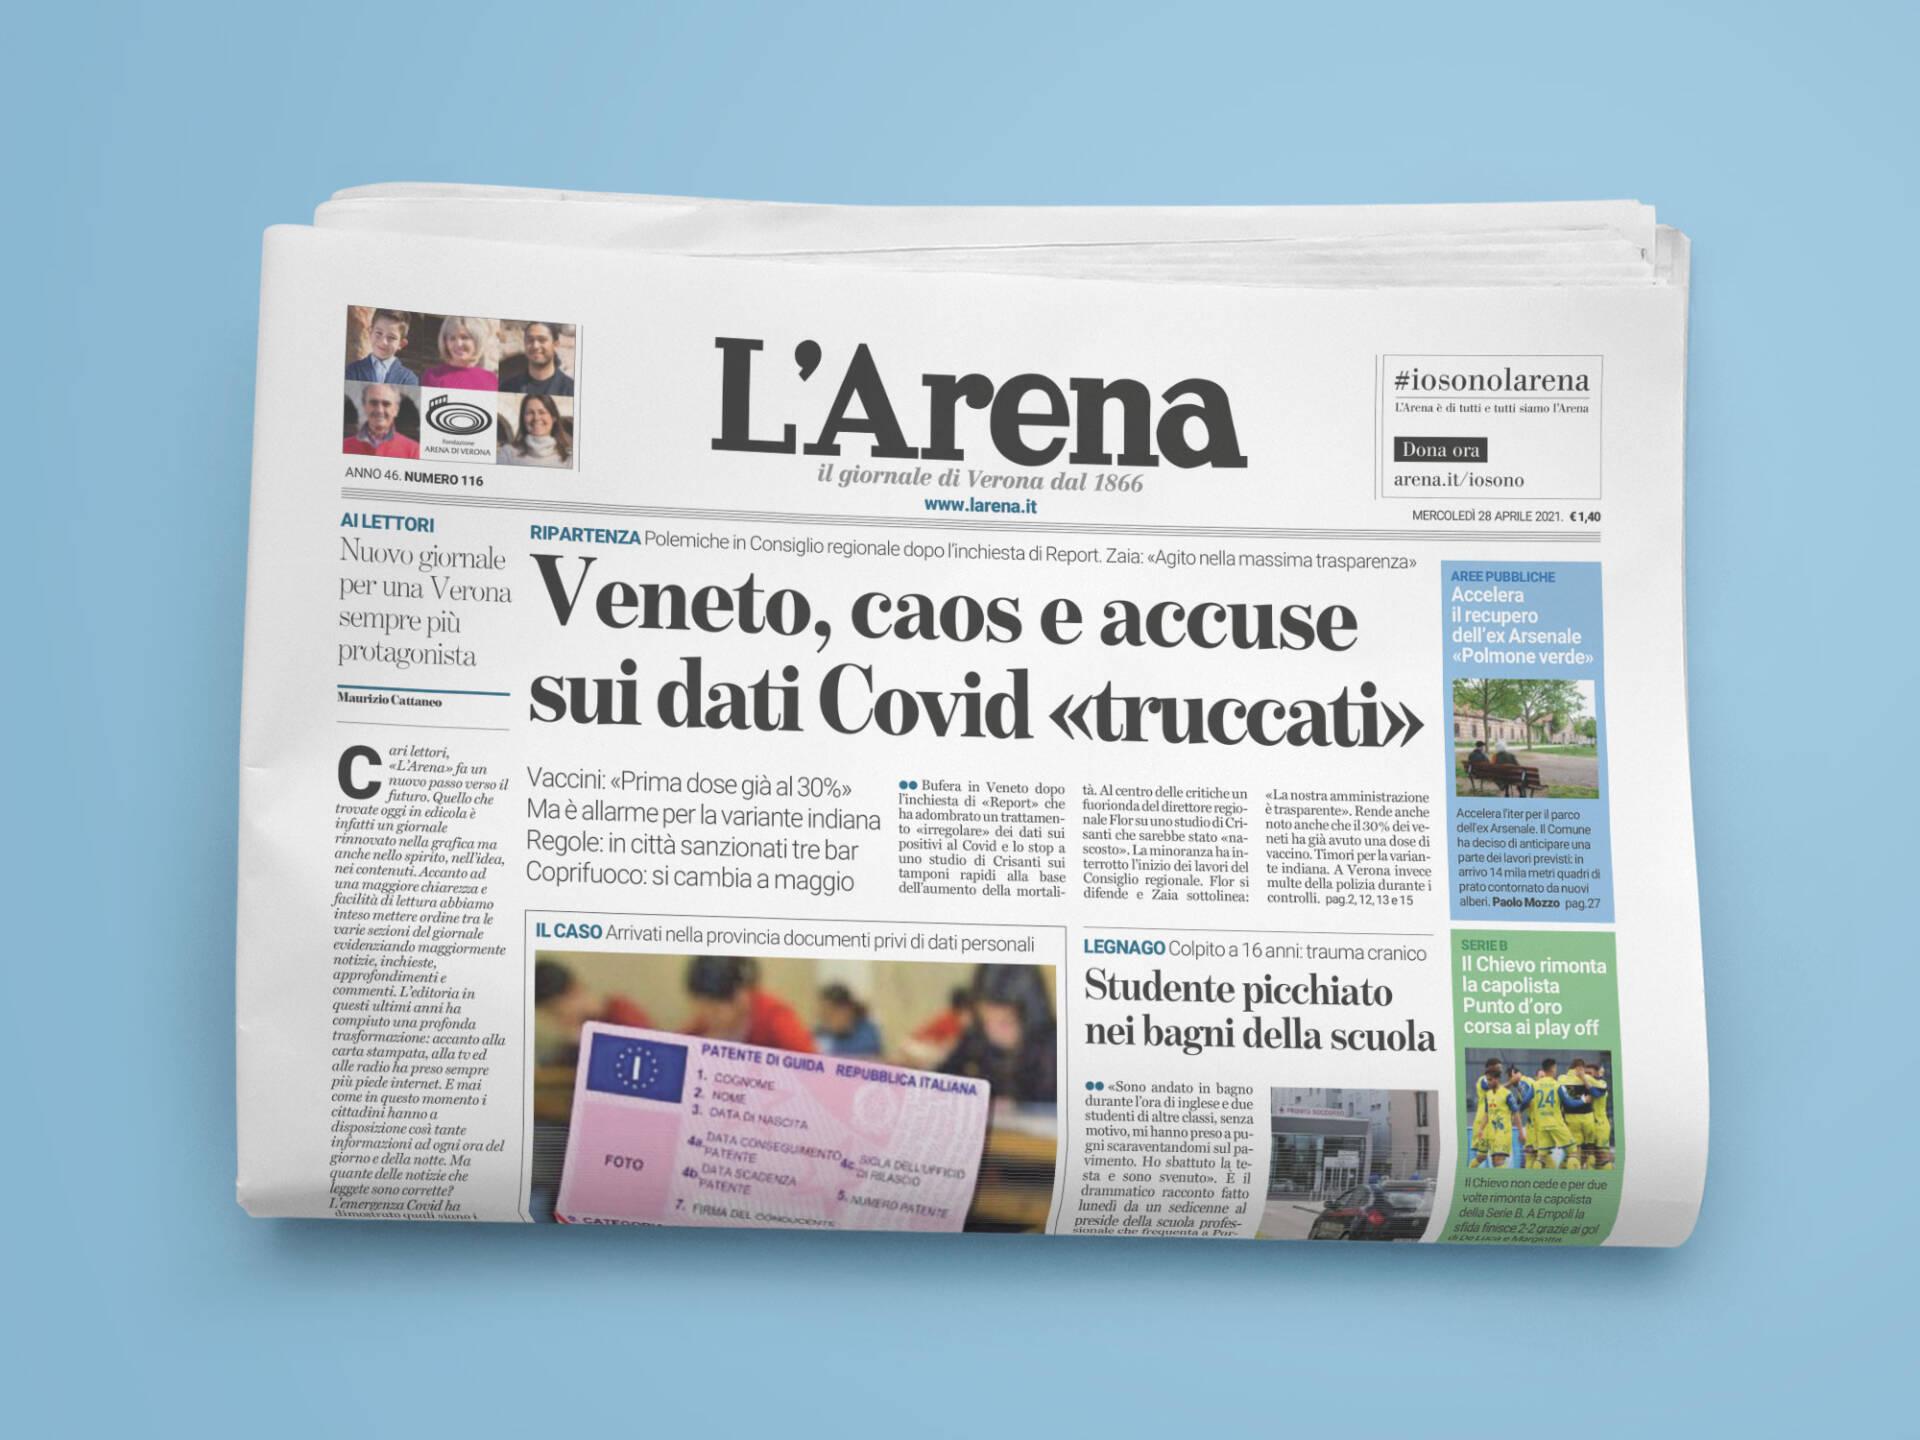 L'arena_01_Wenceslau_News_Design-2021